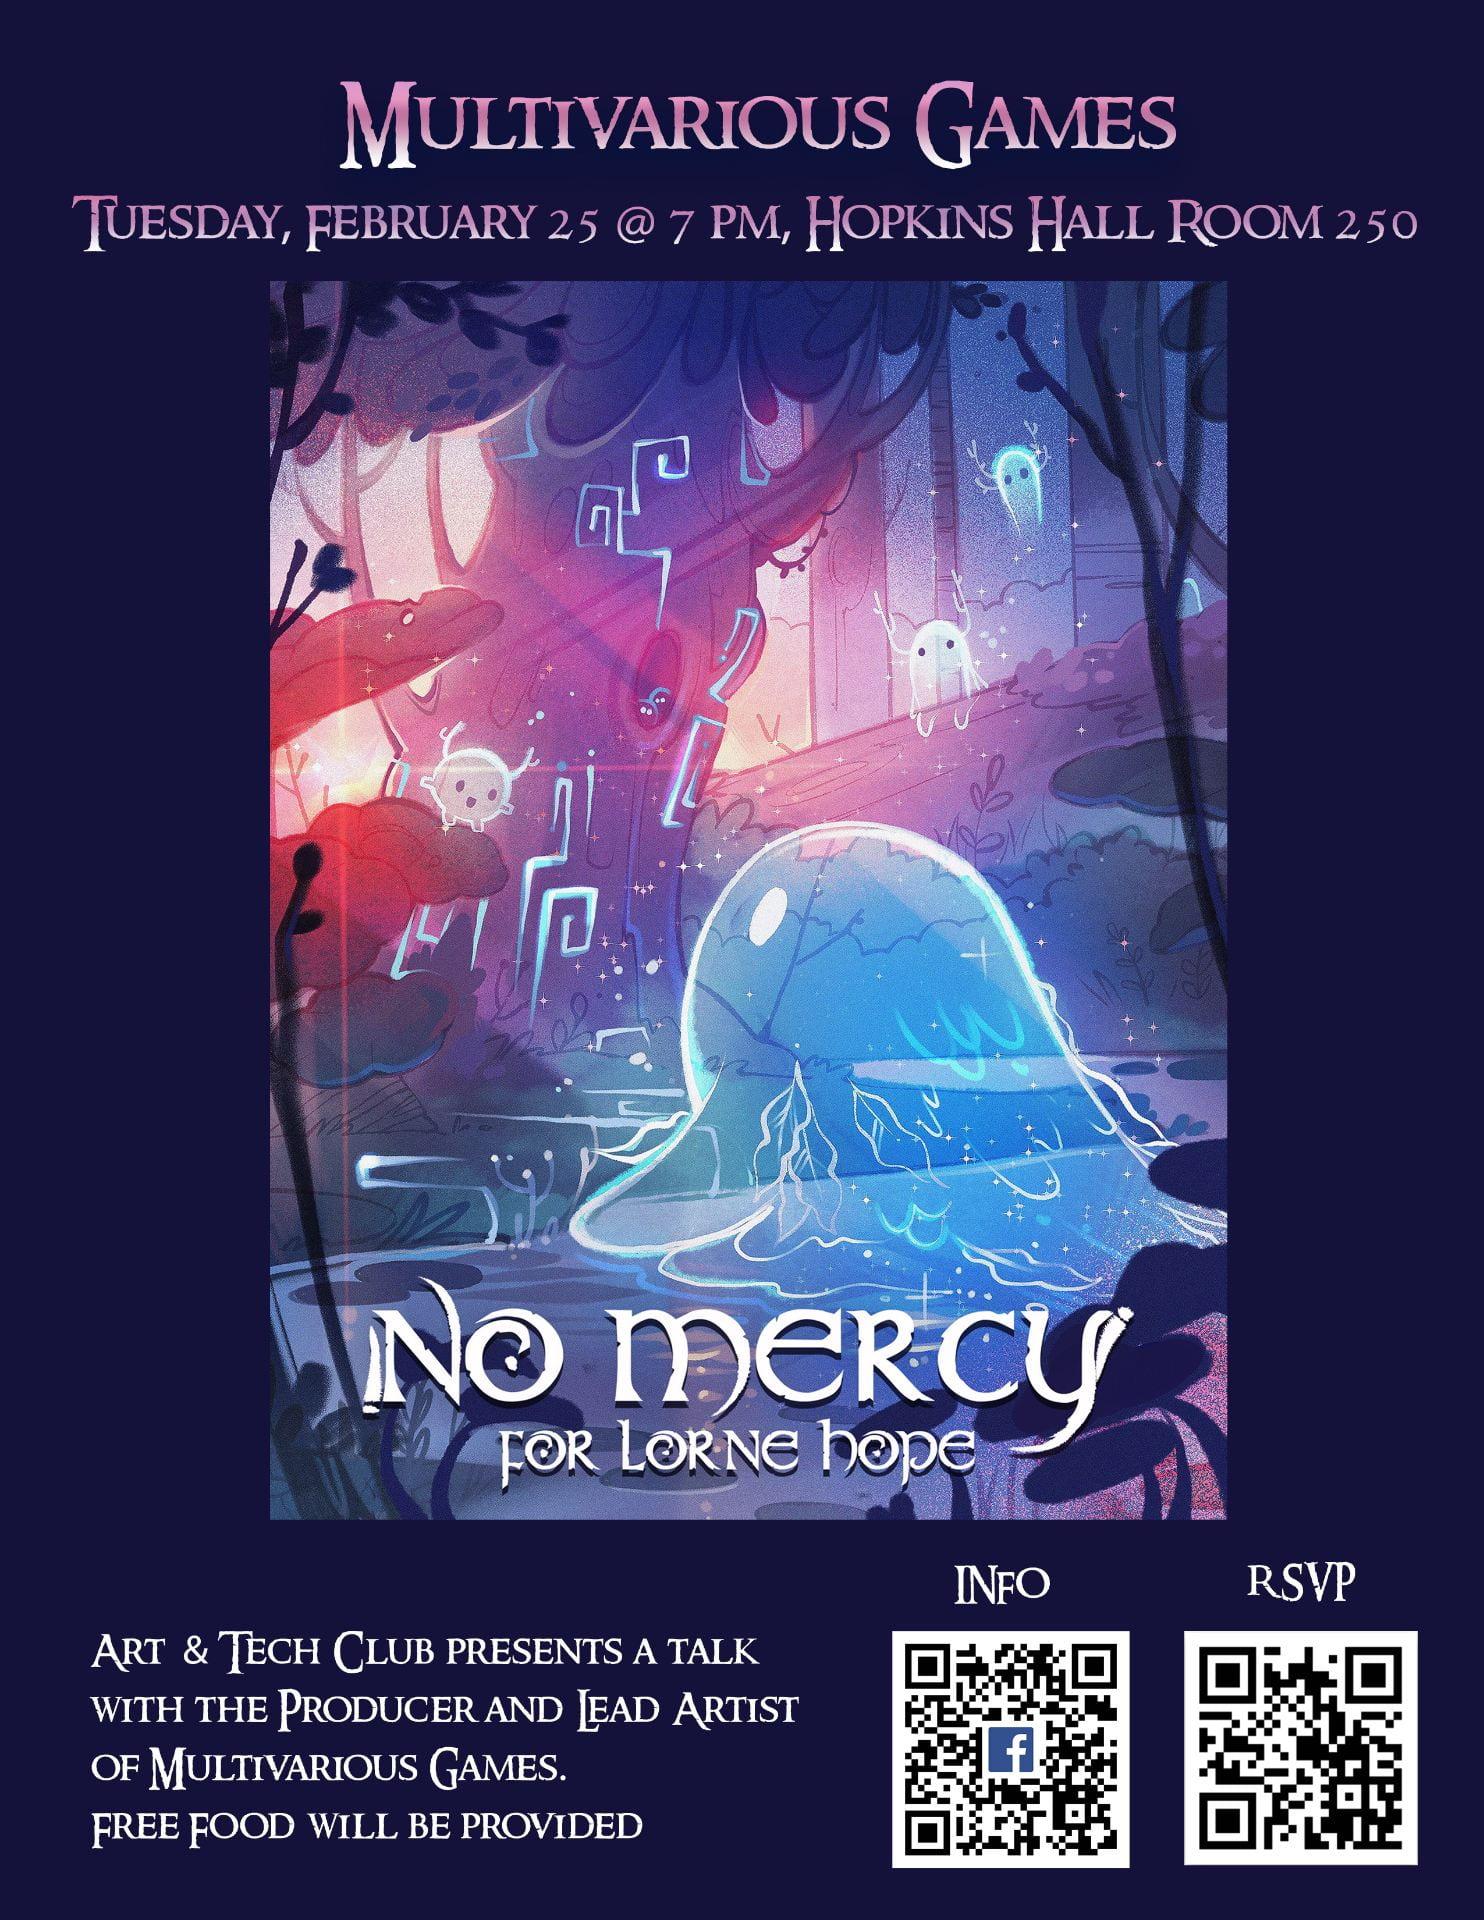 poster for multivarius games event